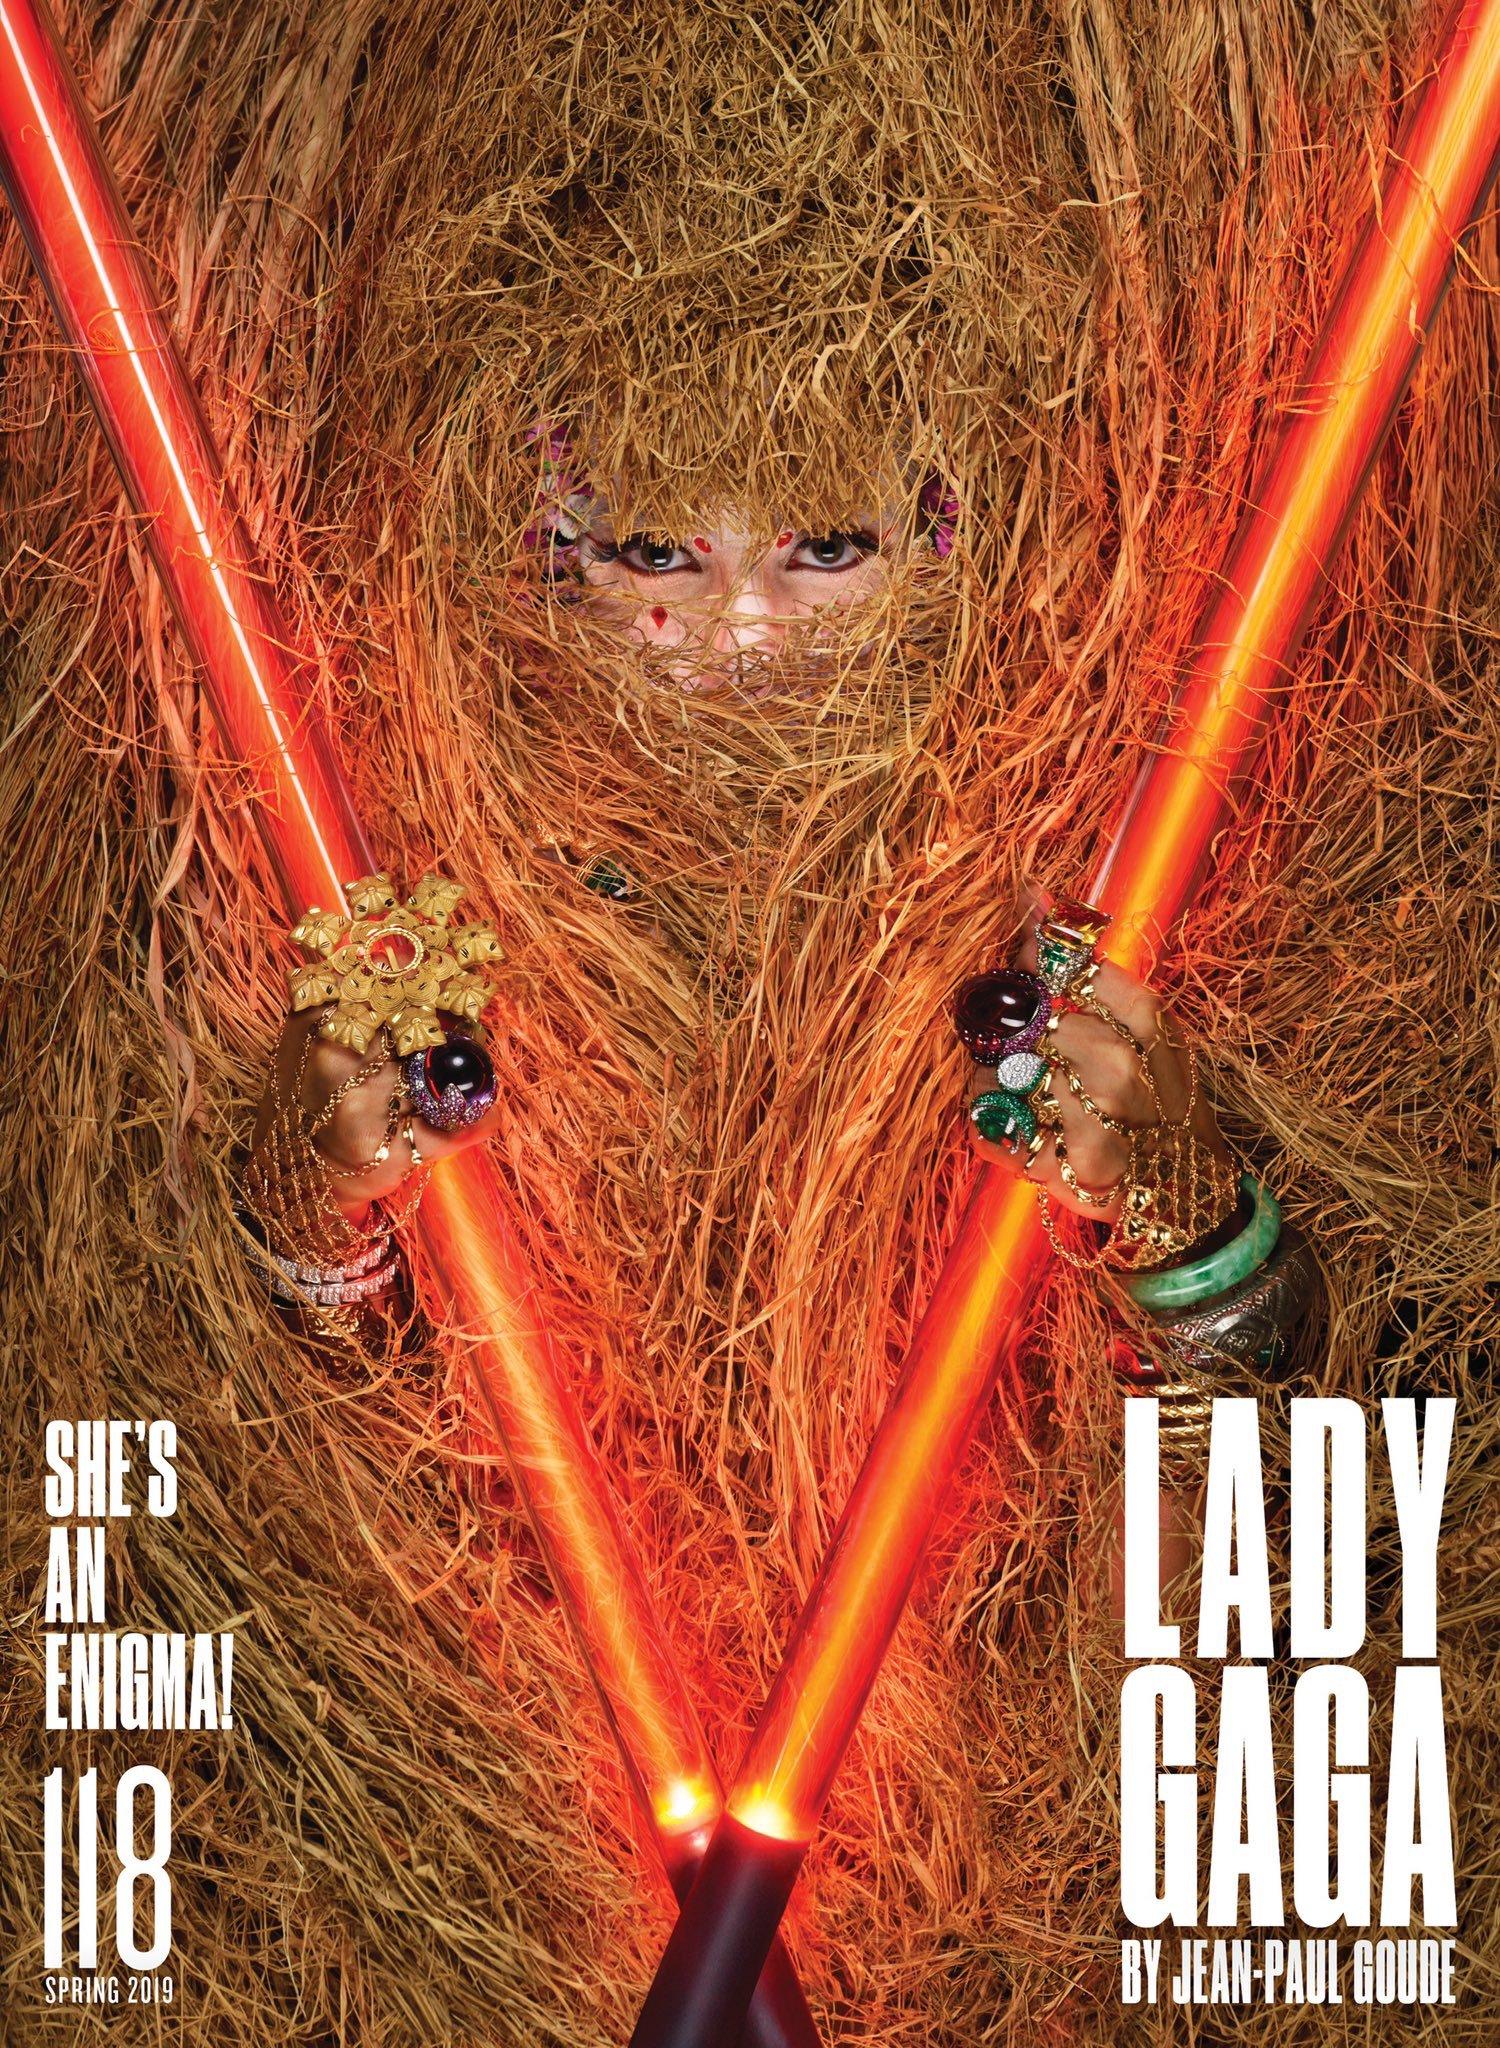 6 - Lady Gaga - Σελίδα 42 D1D7a61XgAEU7tt